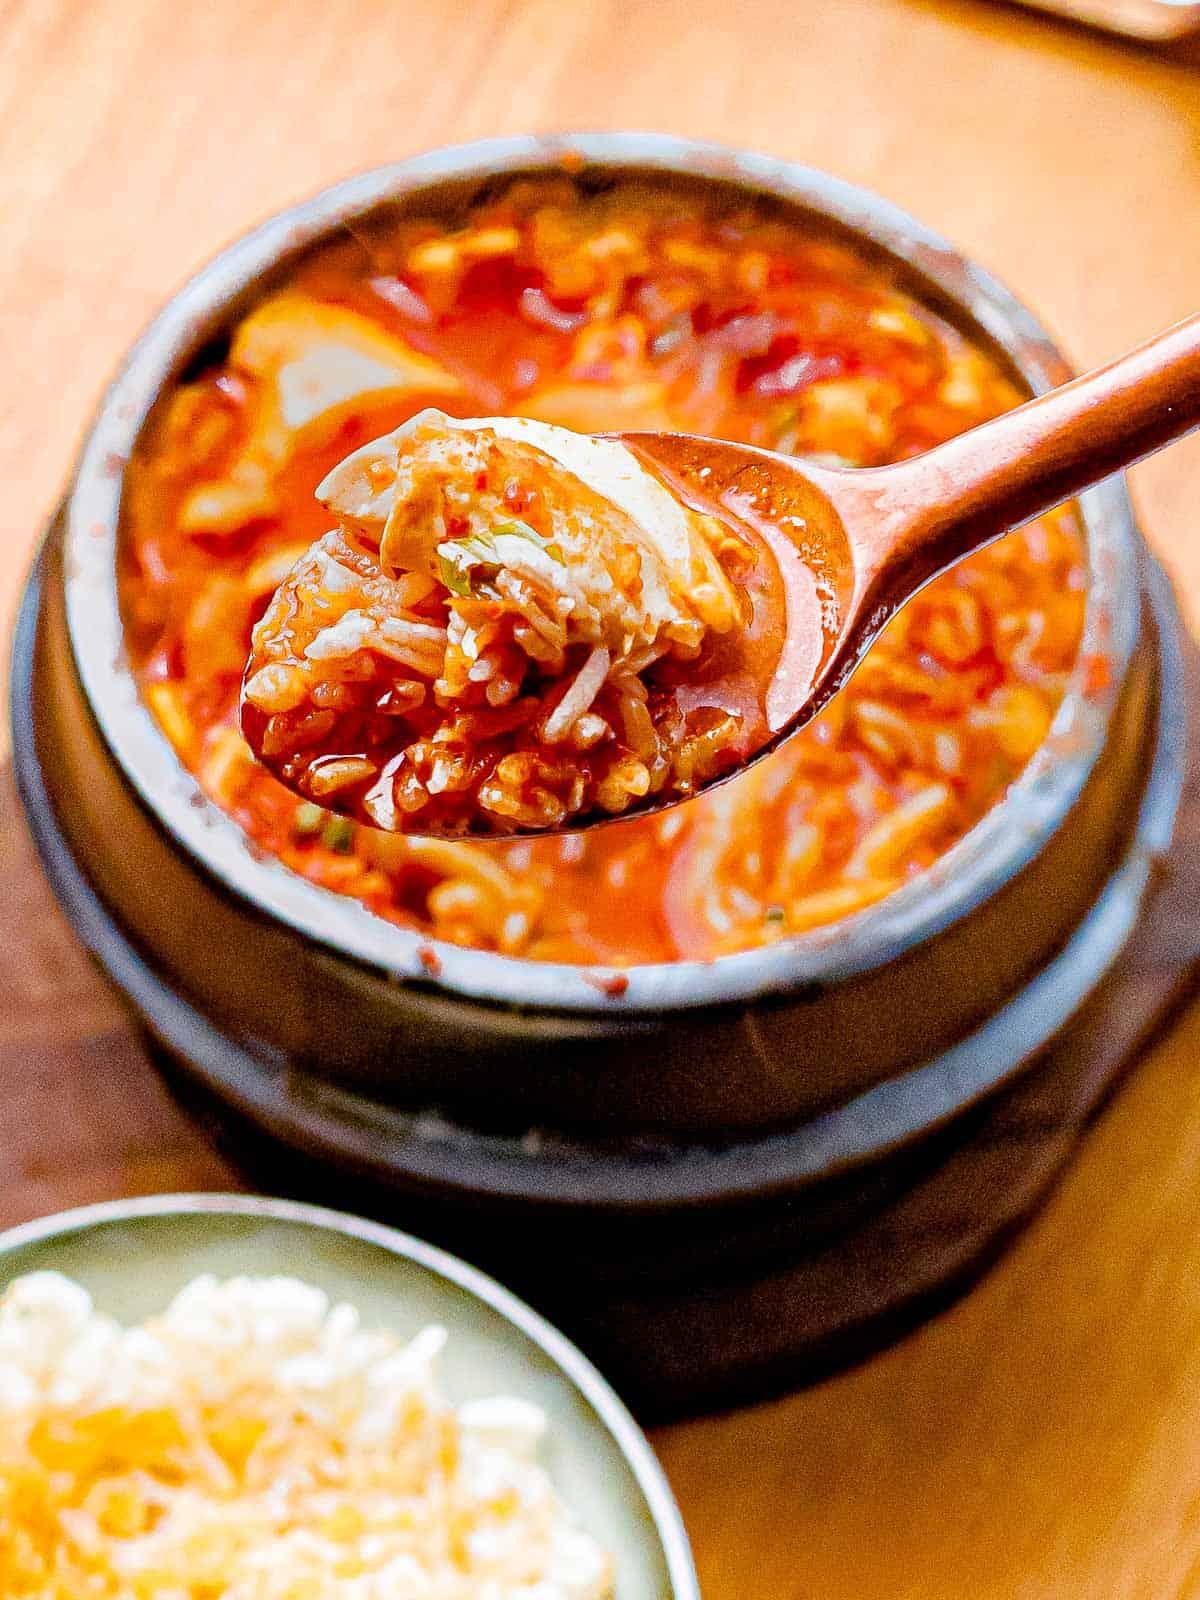 Spoonful of soondubu jiggae with rice.